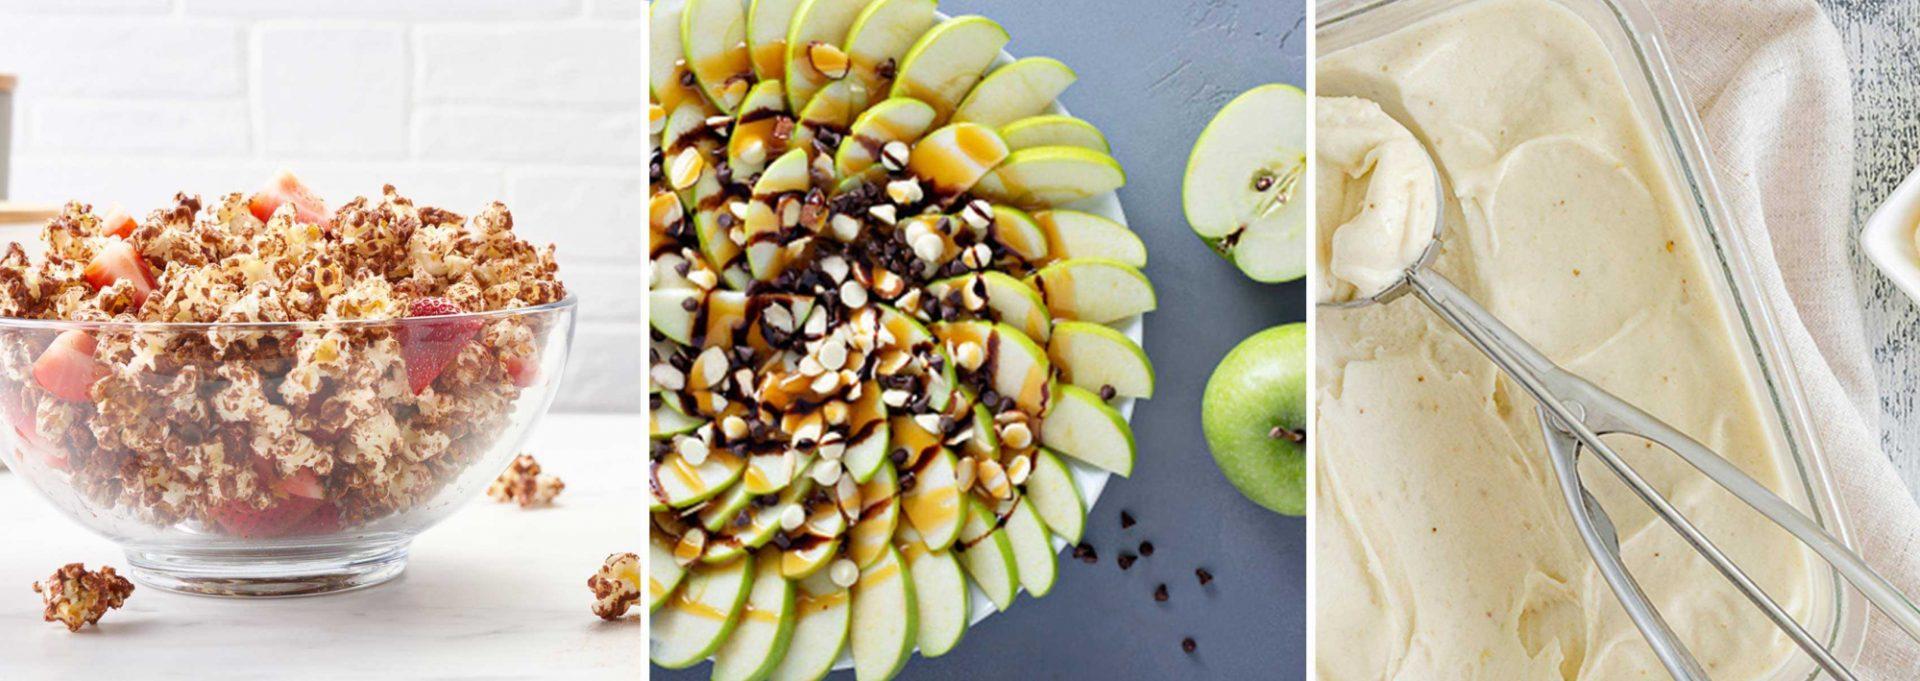 Three photos of healthy snacks: apple nachos, chocolate protein popcorn and banana ice cream.